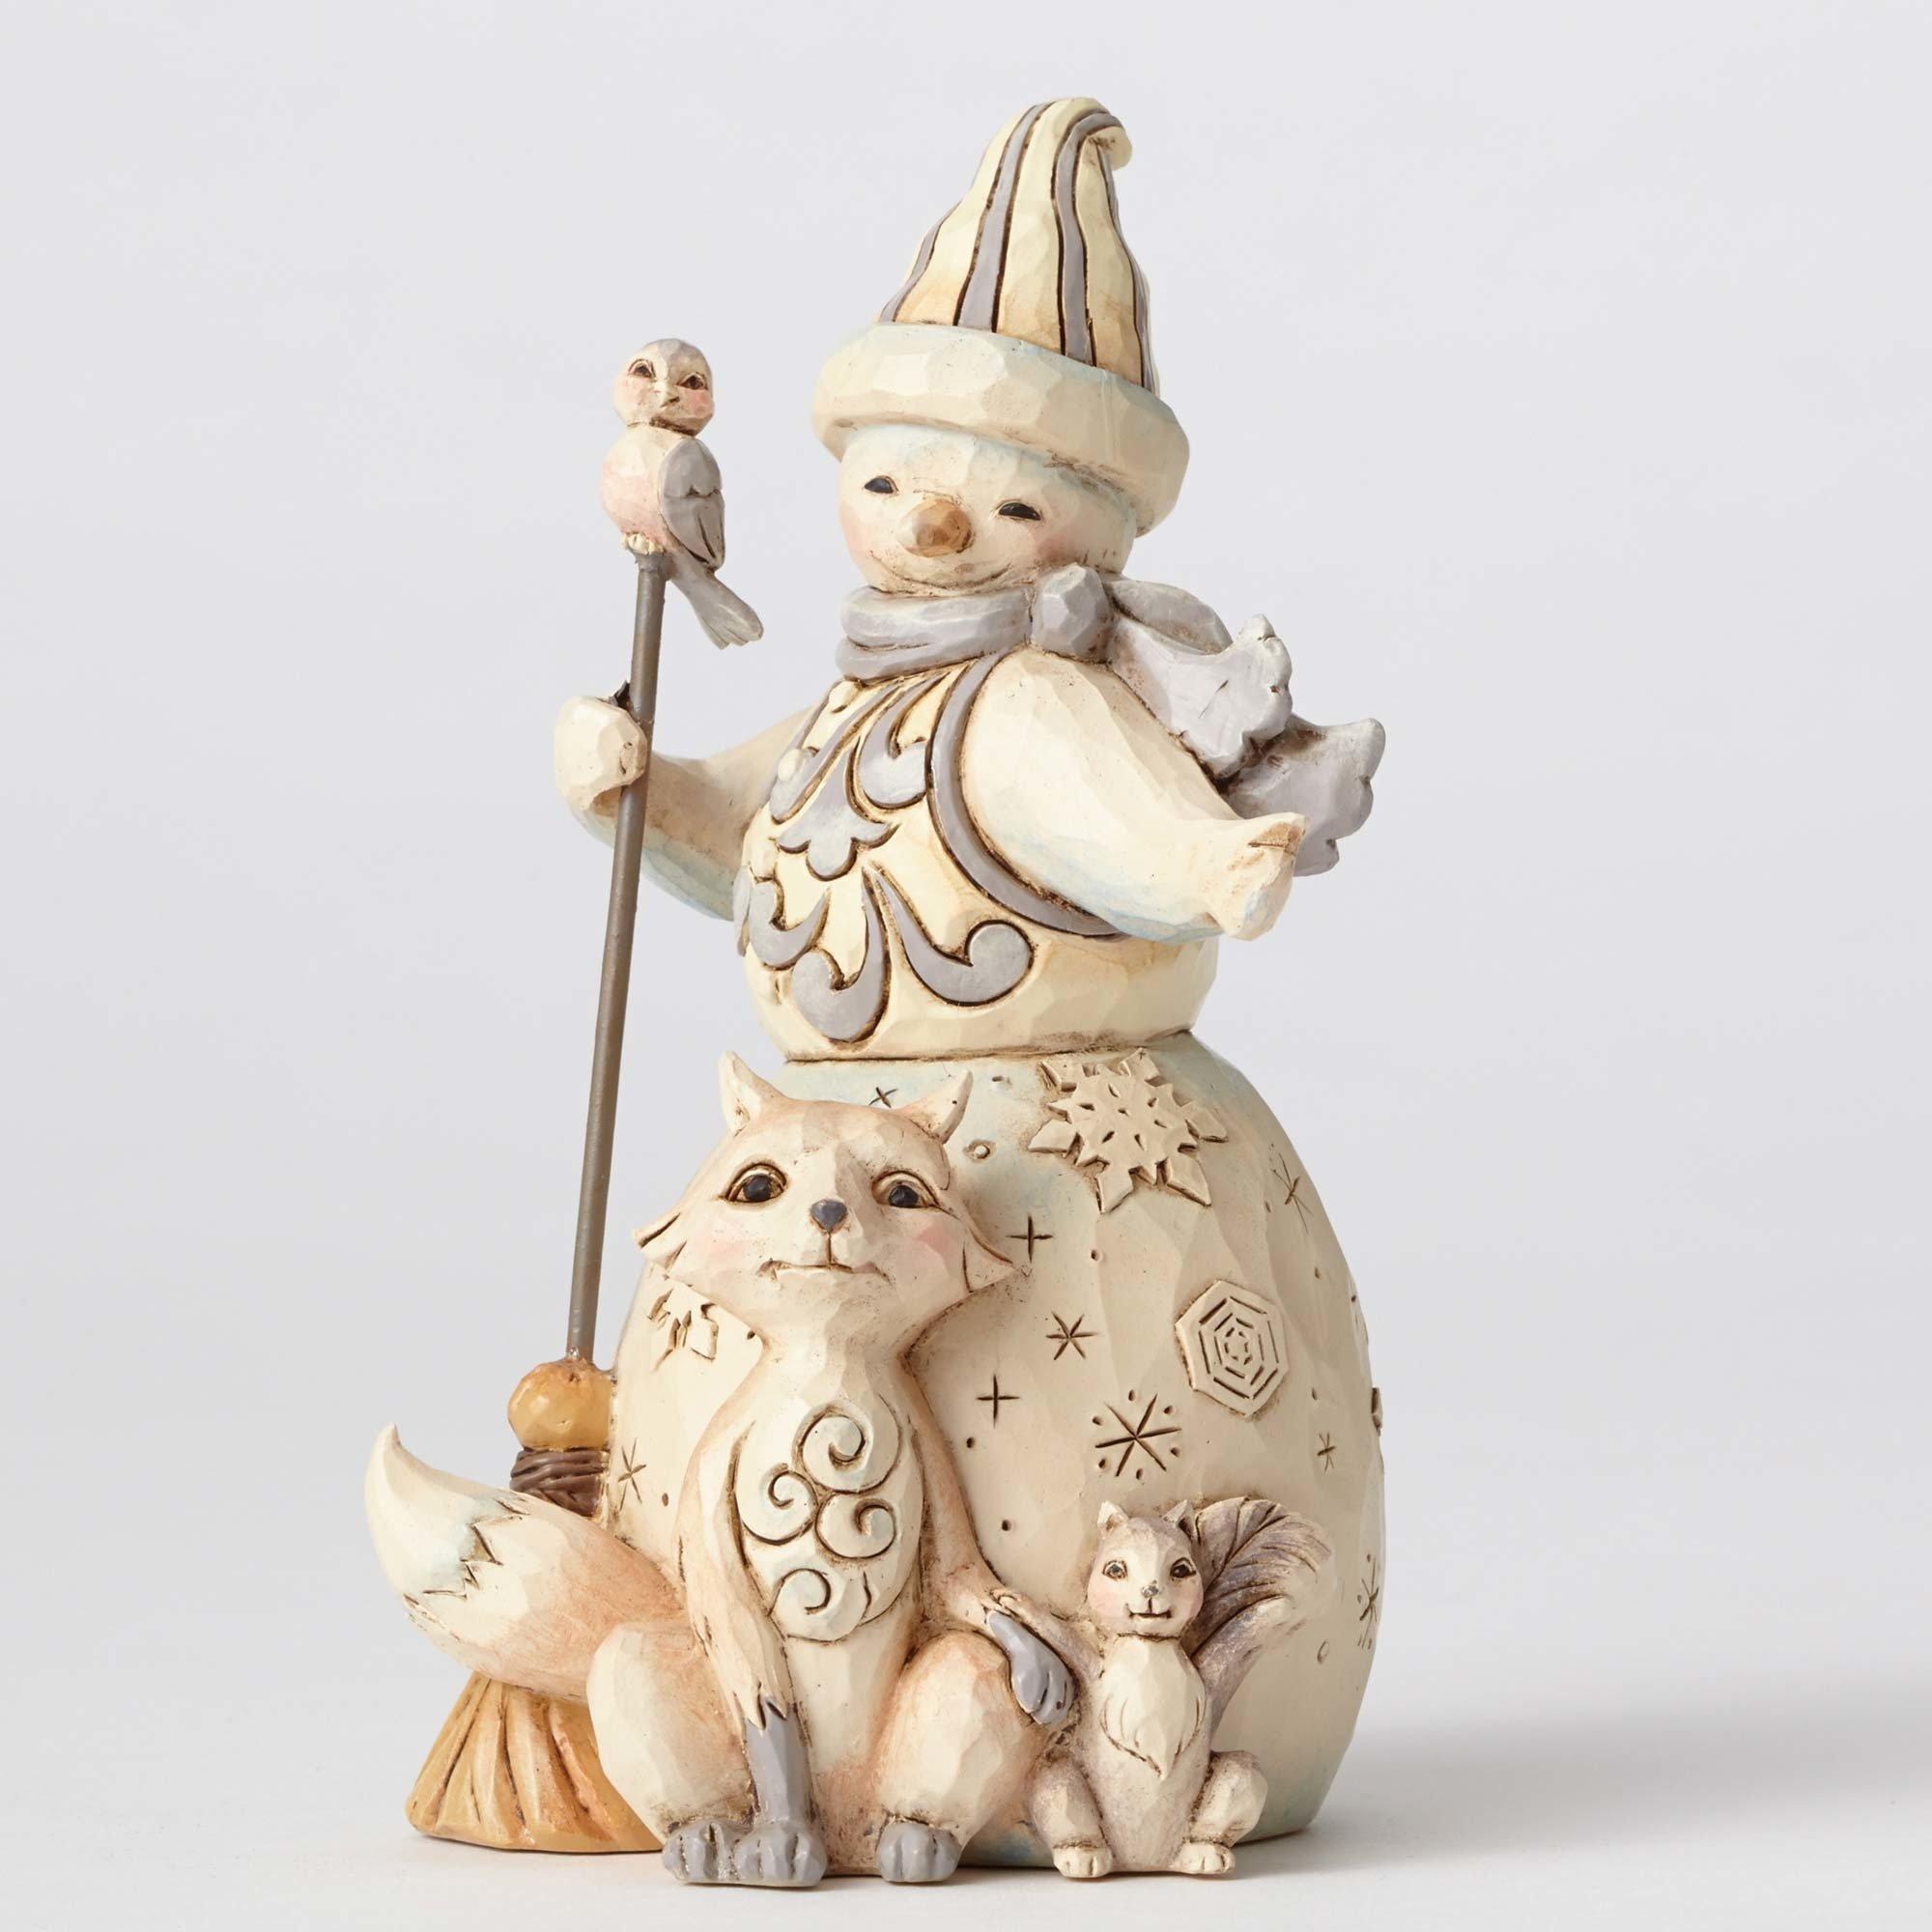 Enesco 4053698 JS HWC Fig Wdlnd Snowman/Anima Figurine